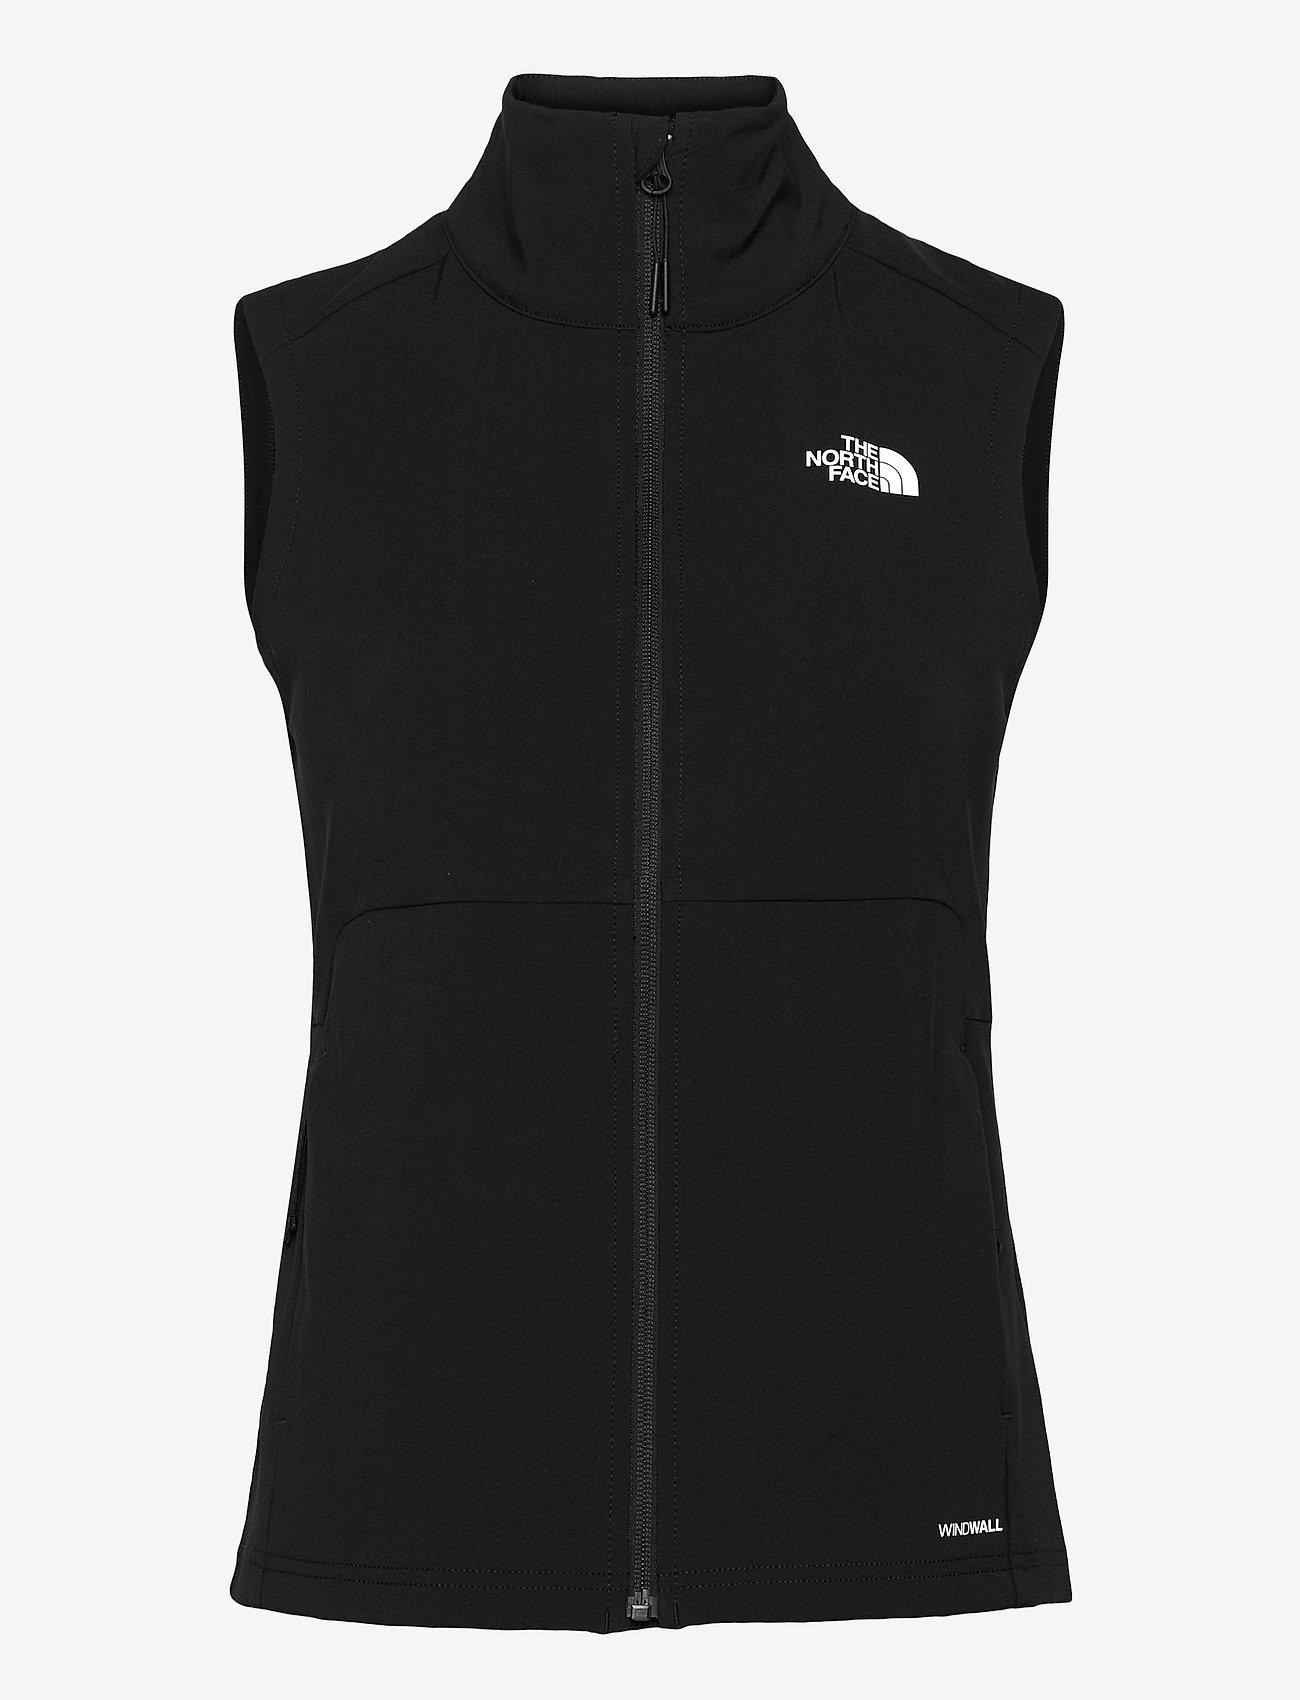 The North Face - W APEX NIMBLE VEST - puffer vests - tnf black - 0